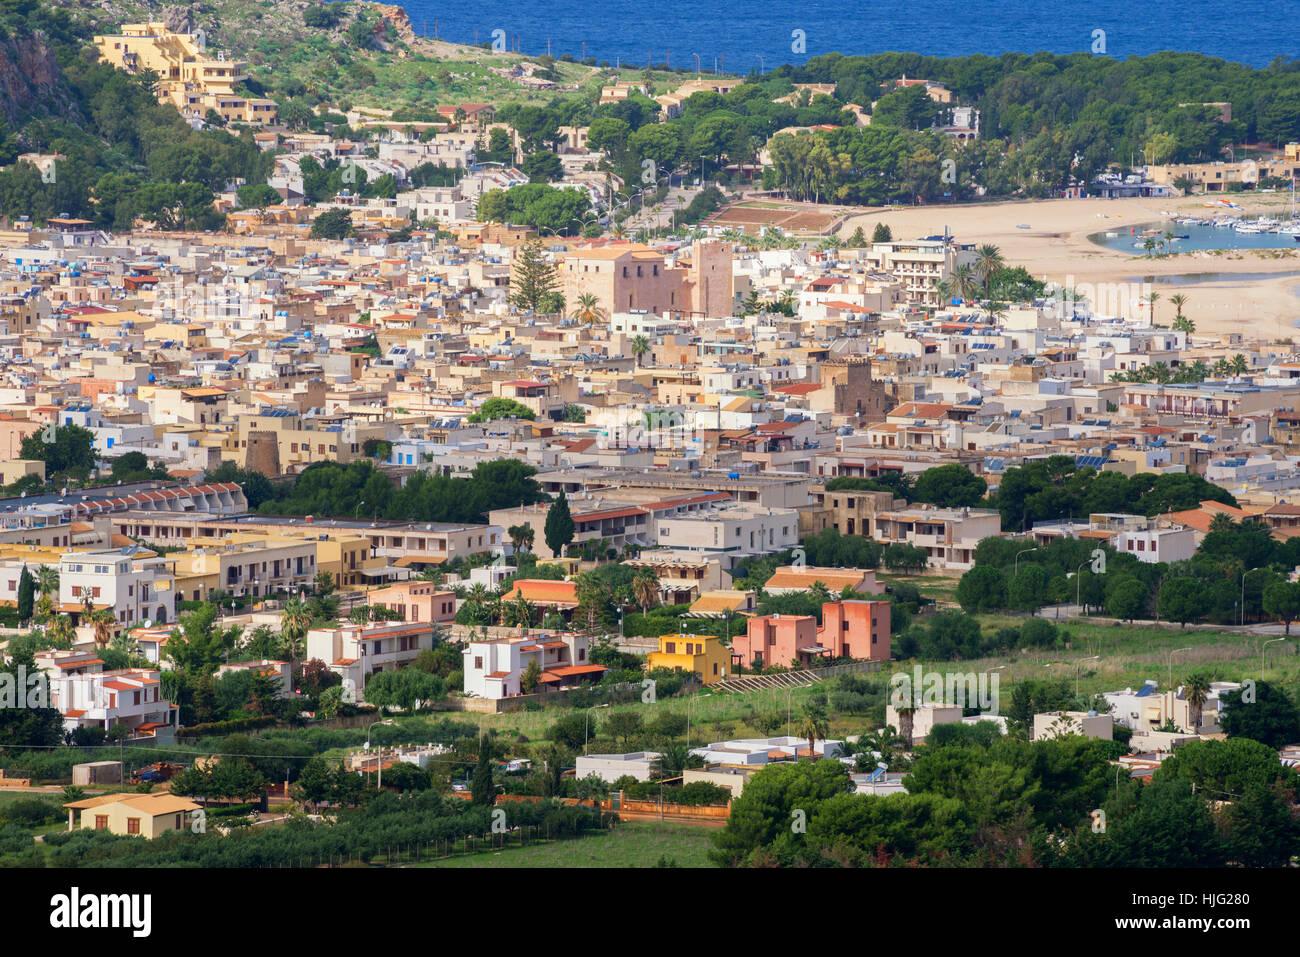 View of San Vito Lo Capo, Sicily, Italy - Stock Image